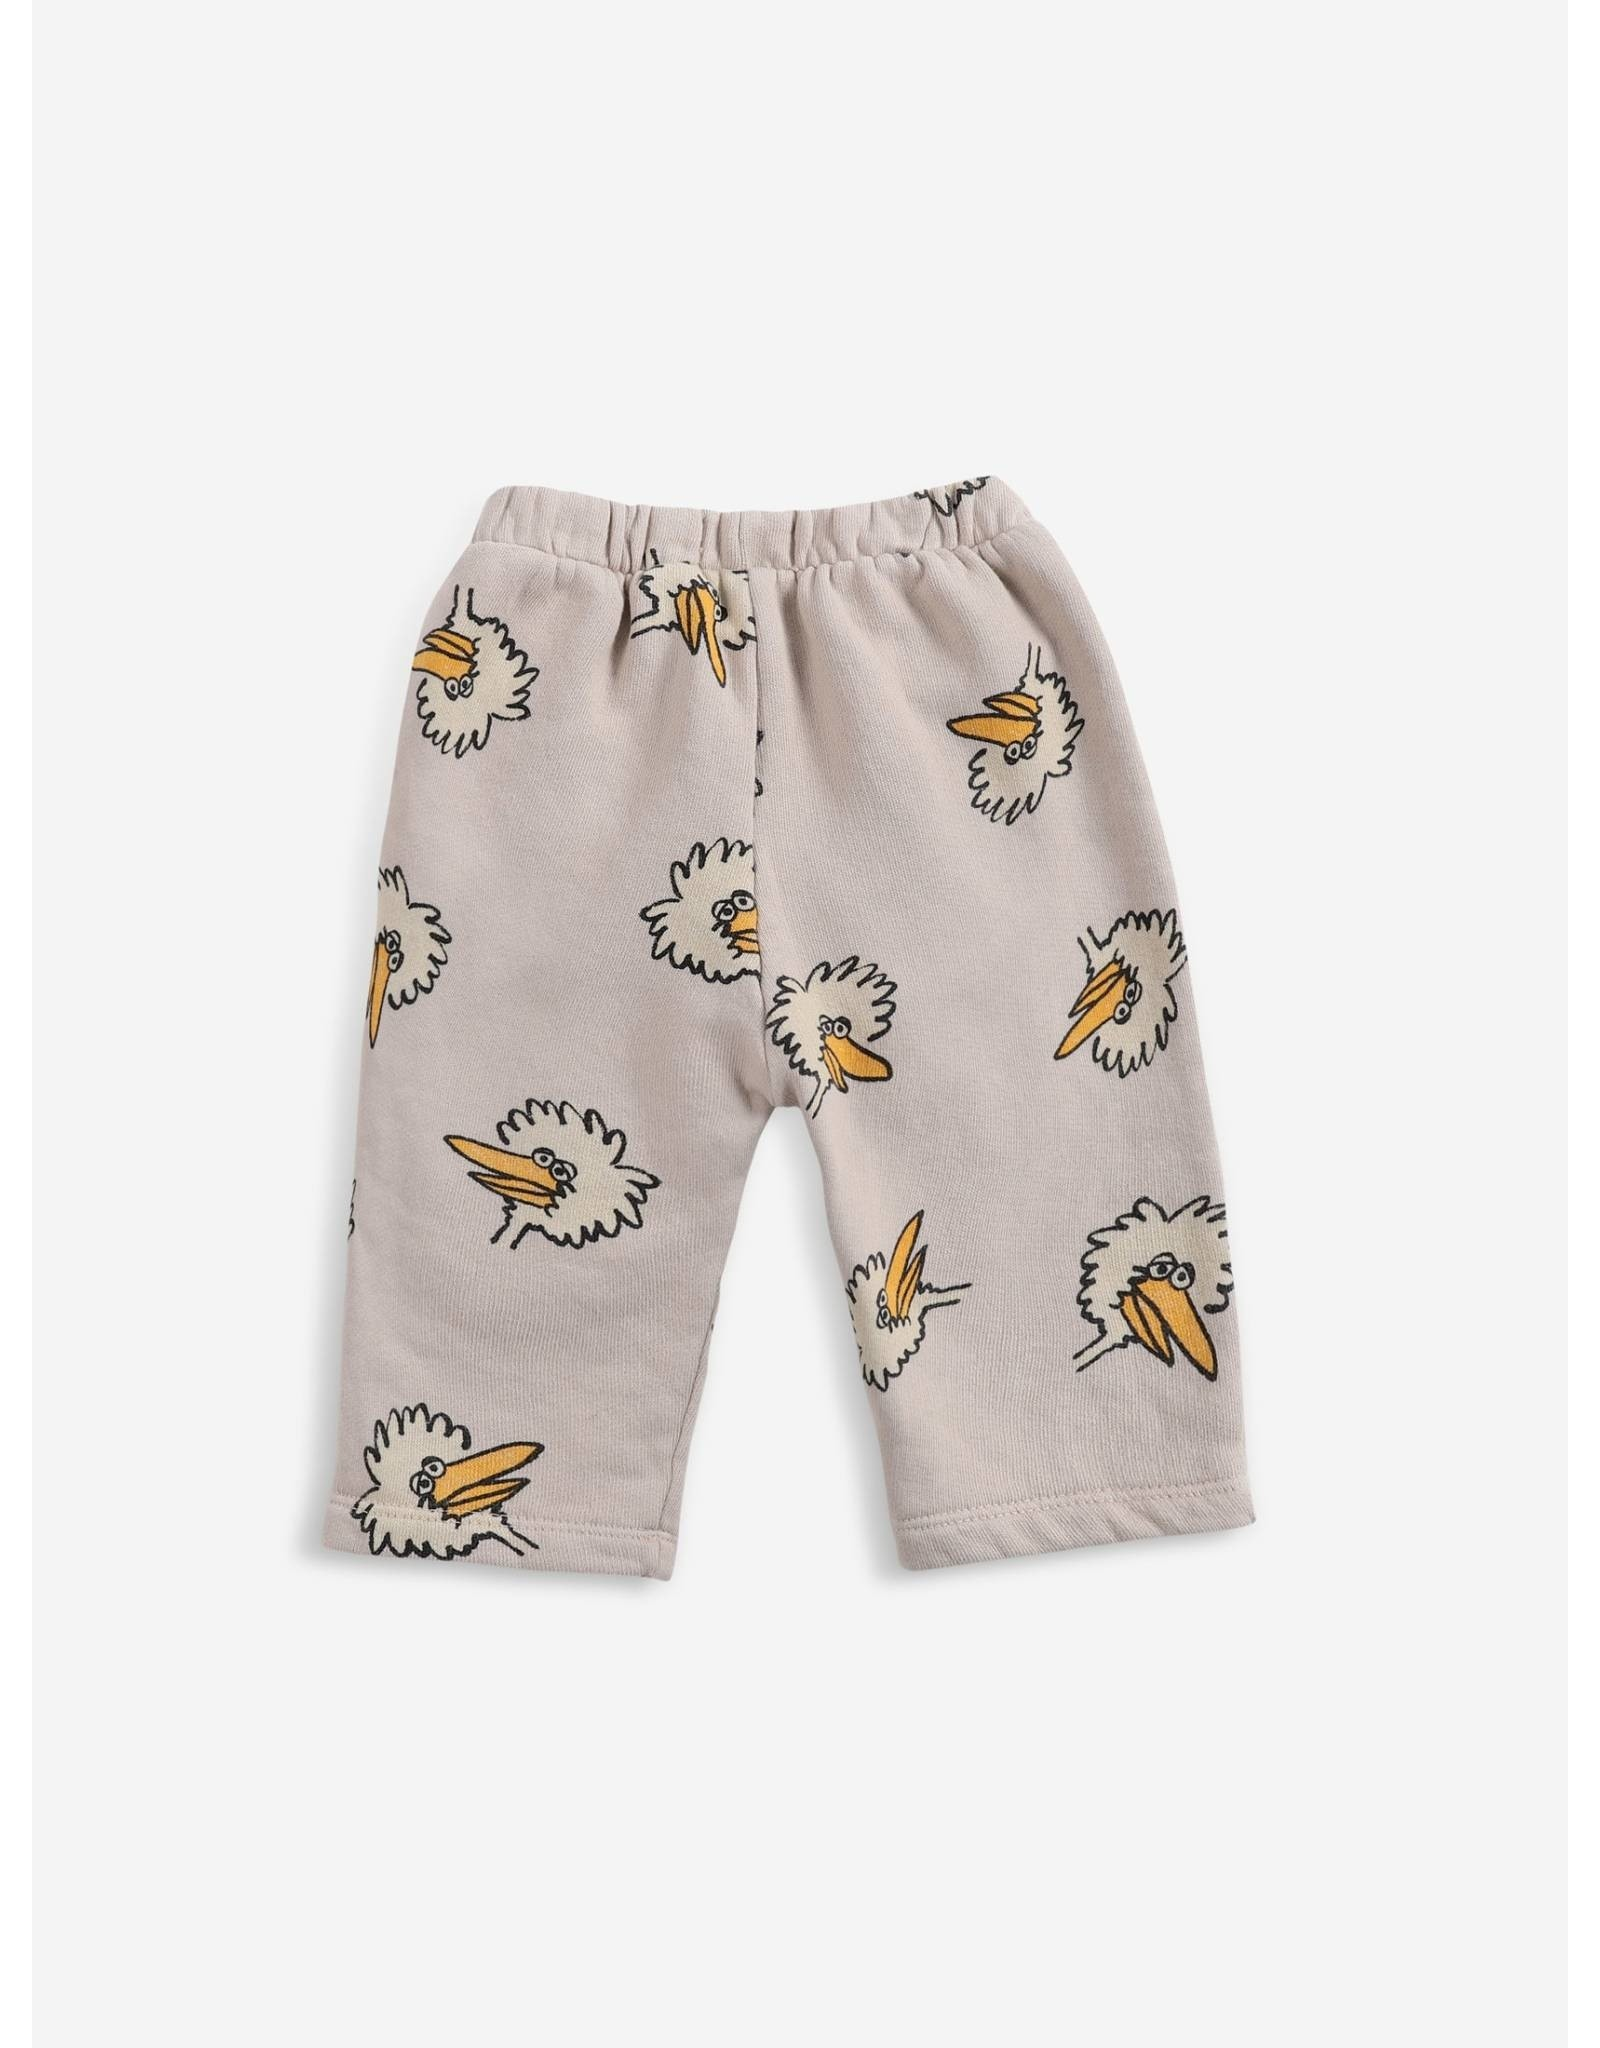 Bobo Choses Bobo Choses Birdie All Over Jogging Pants